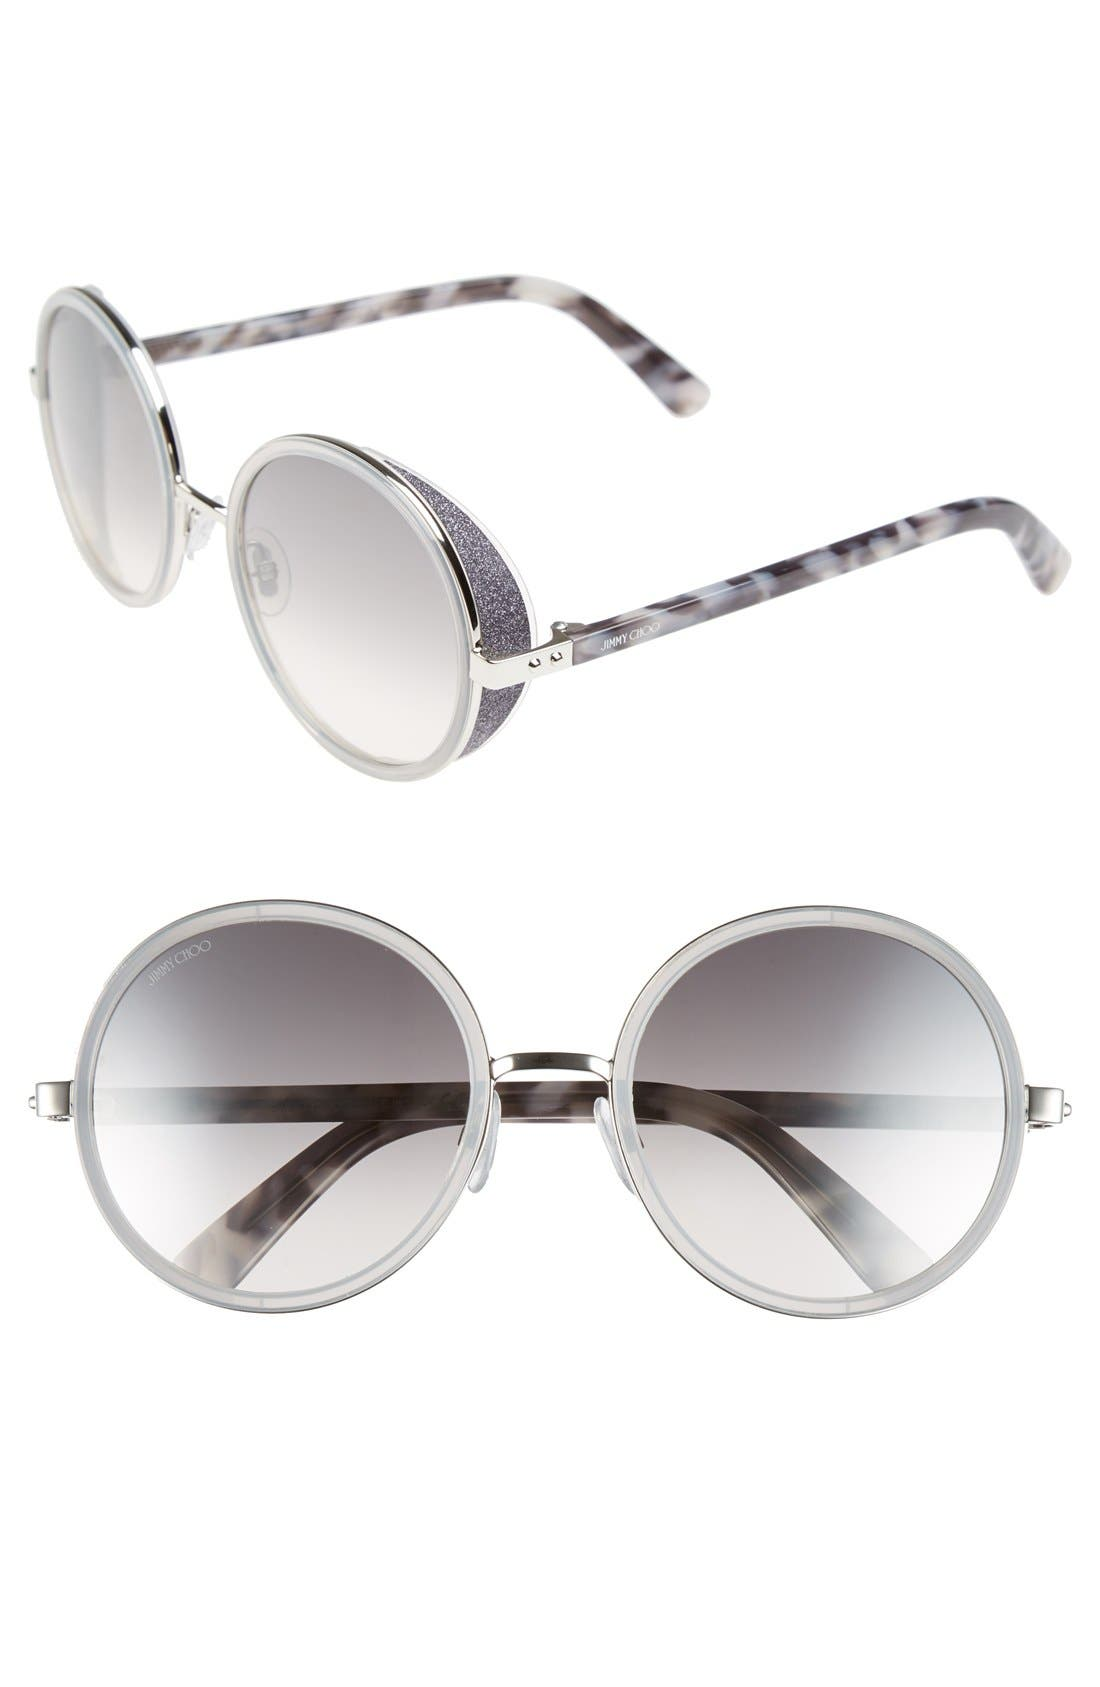 Main Image - Jimmy Choo'Andies' 54mm Round Sunglasses